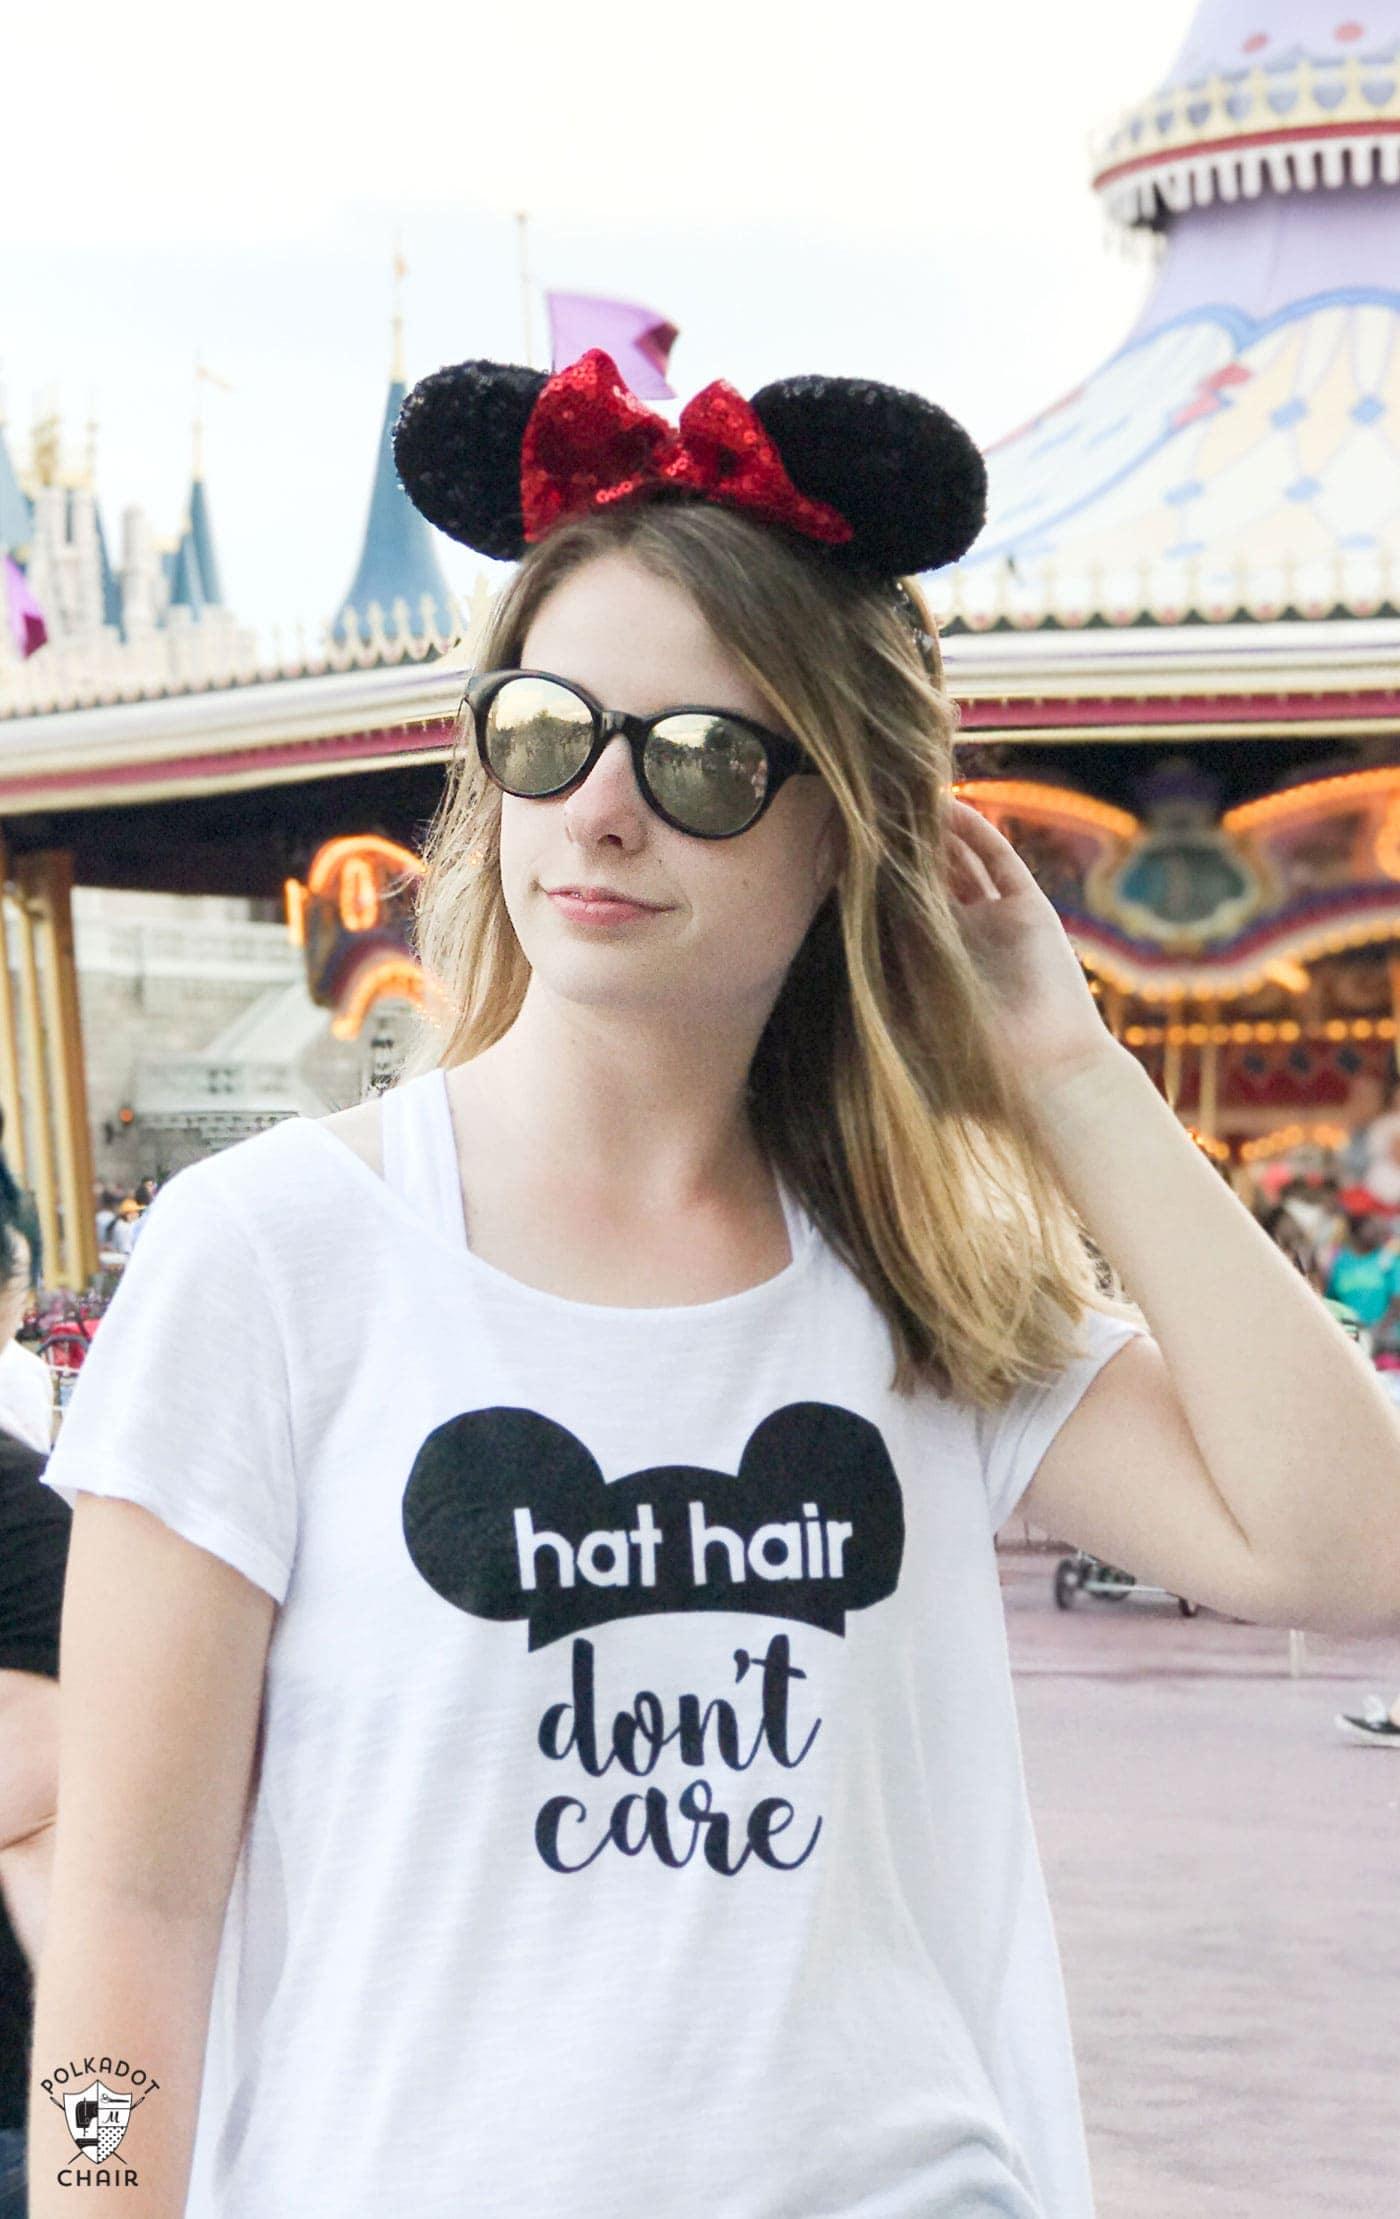 Diy disney t shirt hat hair don 39 t care the polka dot chair for Diy disney shirt template